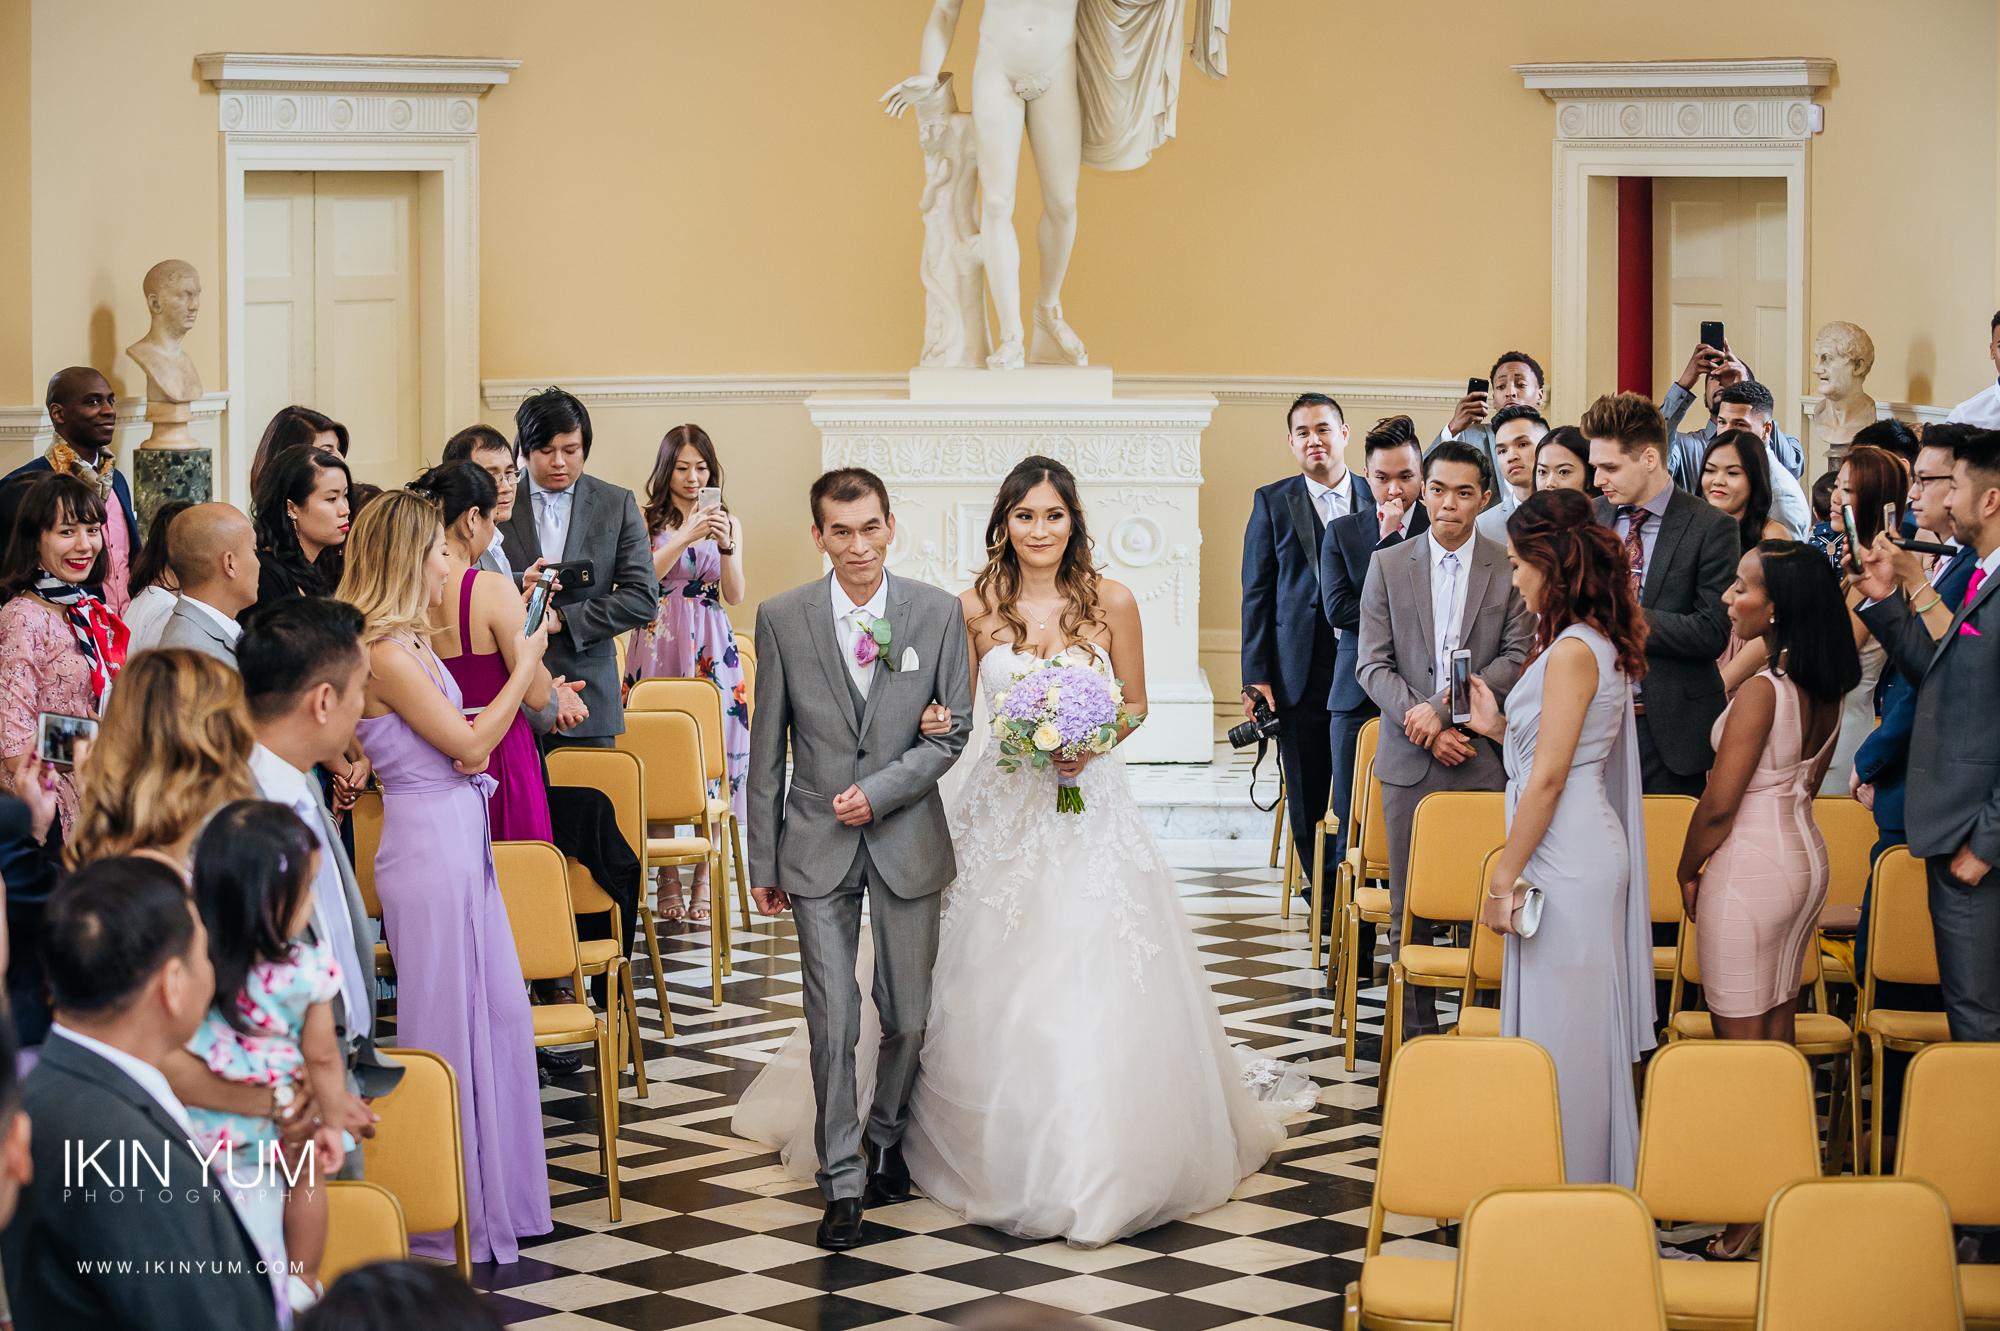 Syon Park Wedding - Ikin Yum Photography -045.jpg